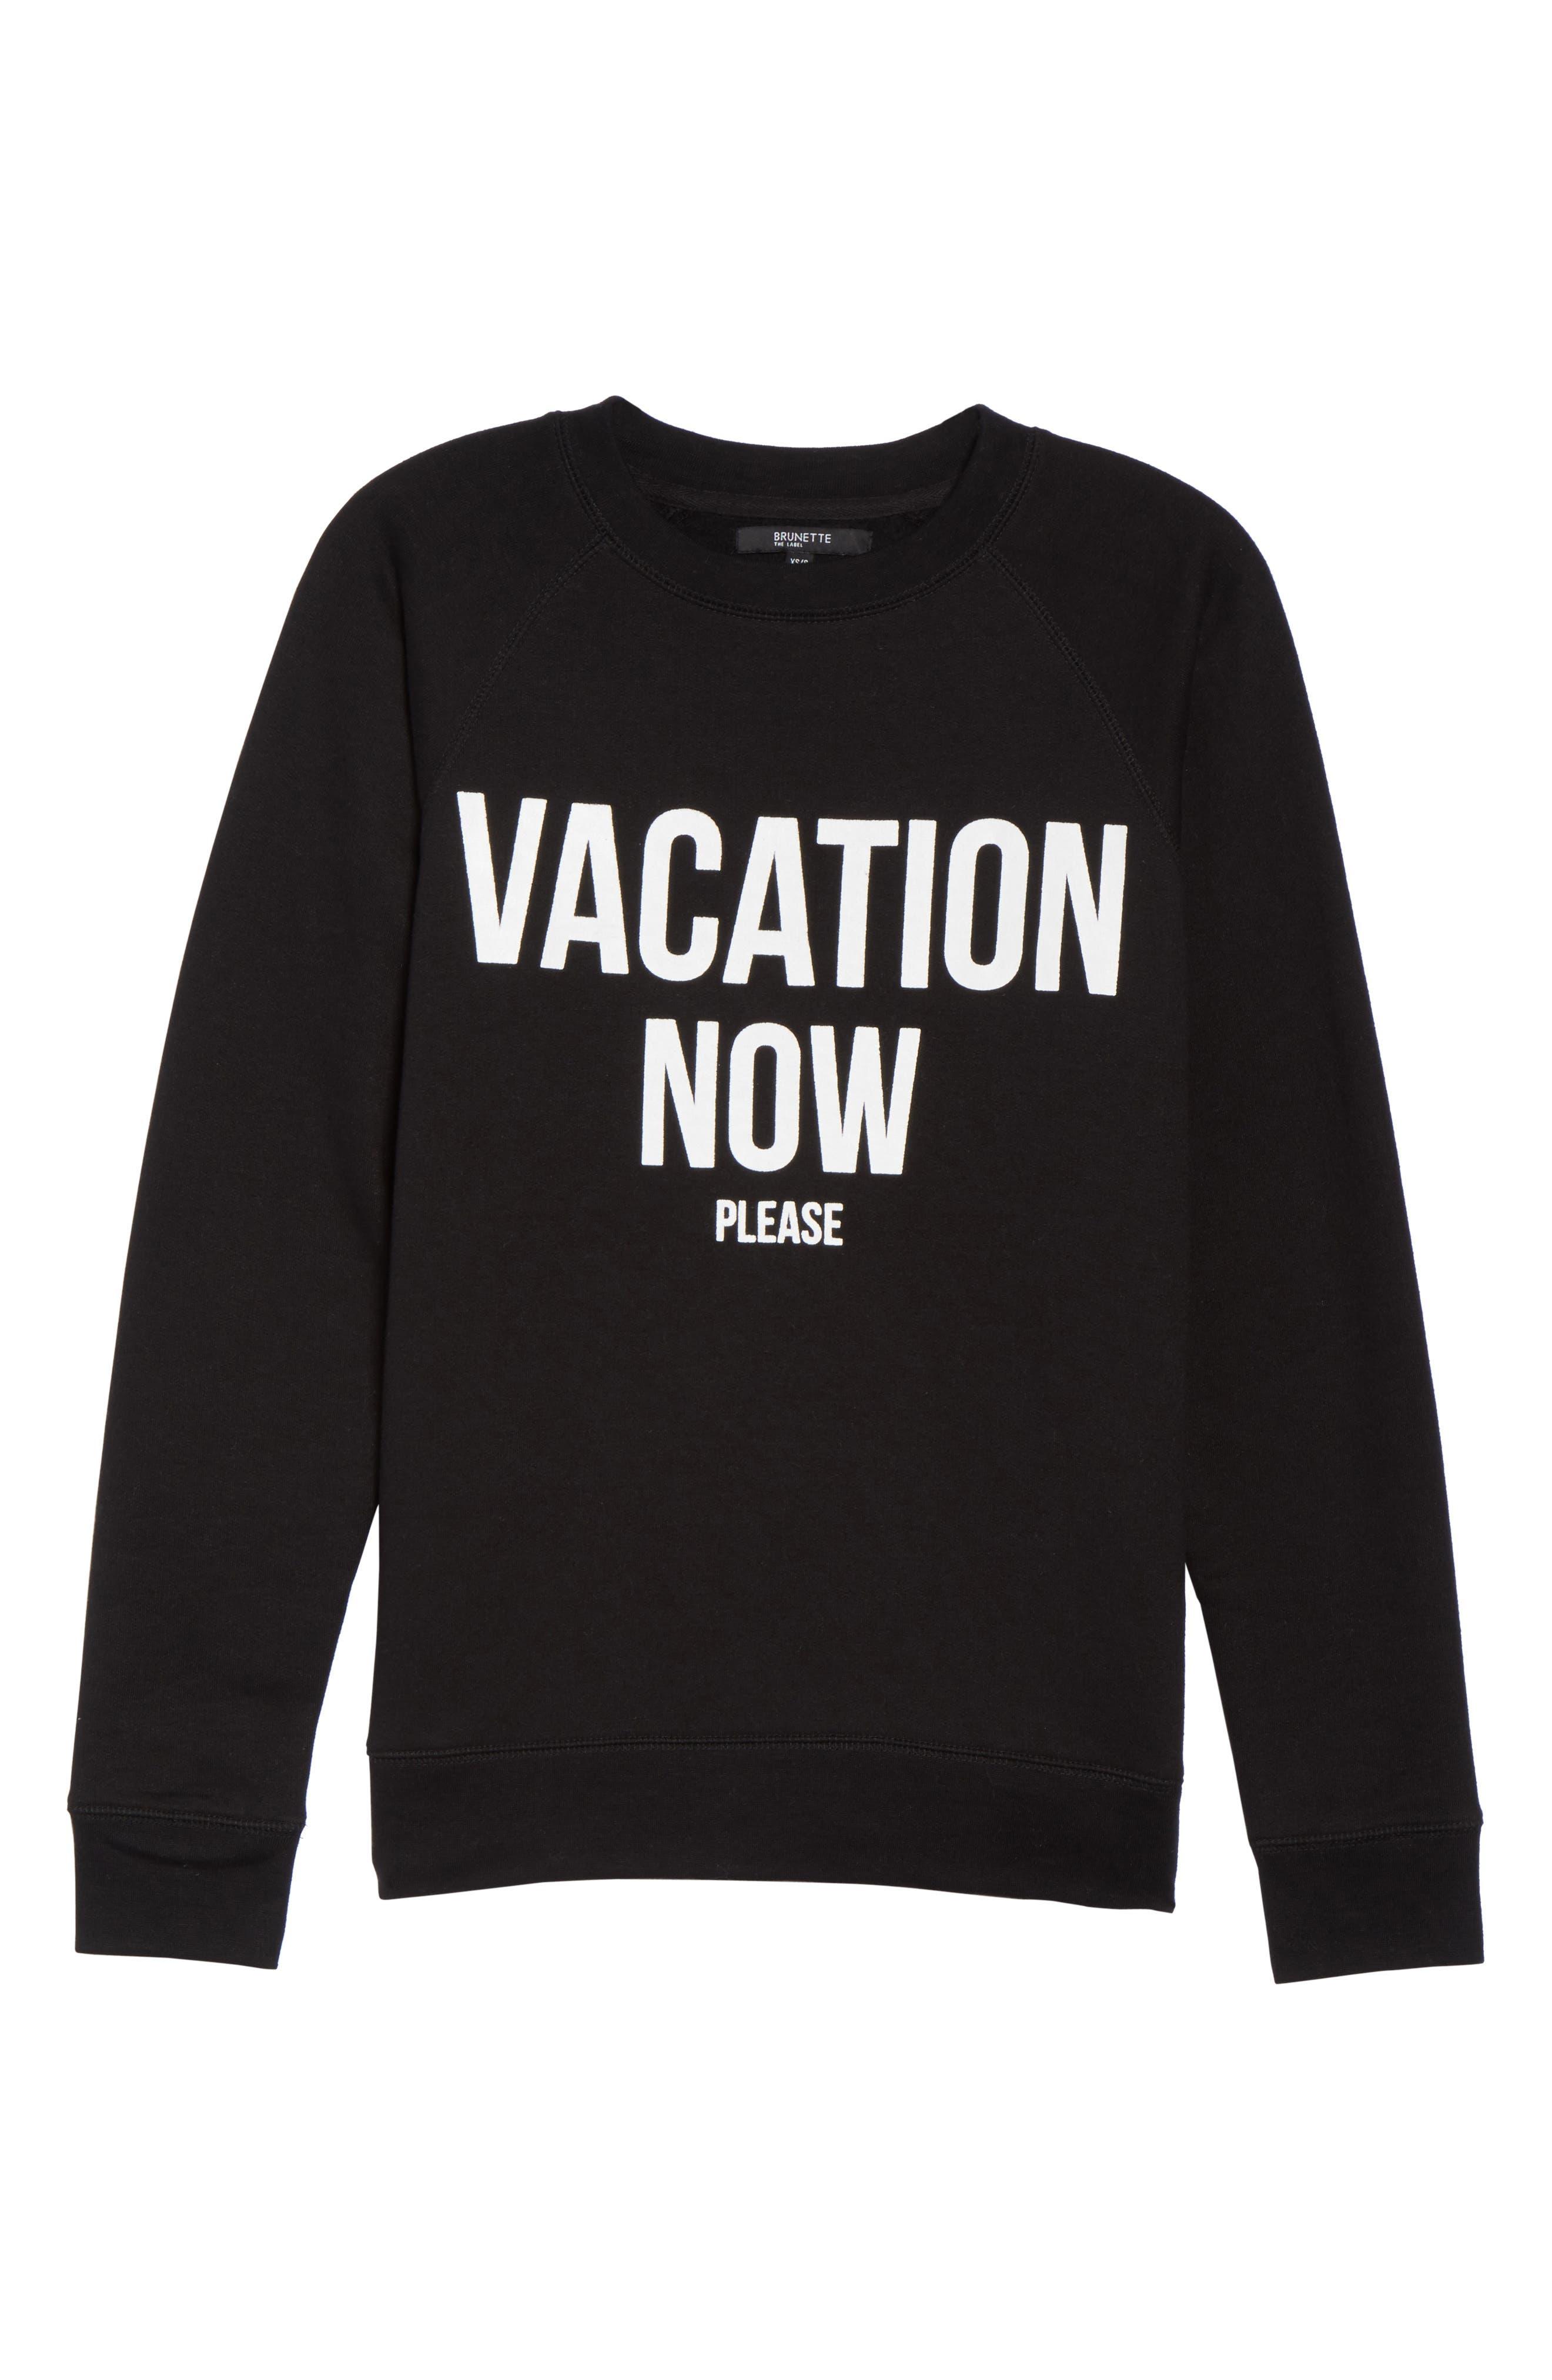 Vacation Now Sweatshirt,                             Alternate thumbnail 6, color,                             001